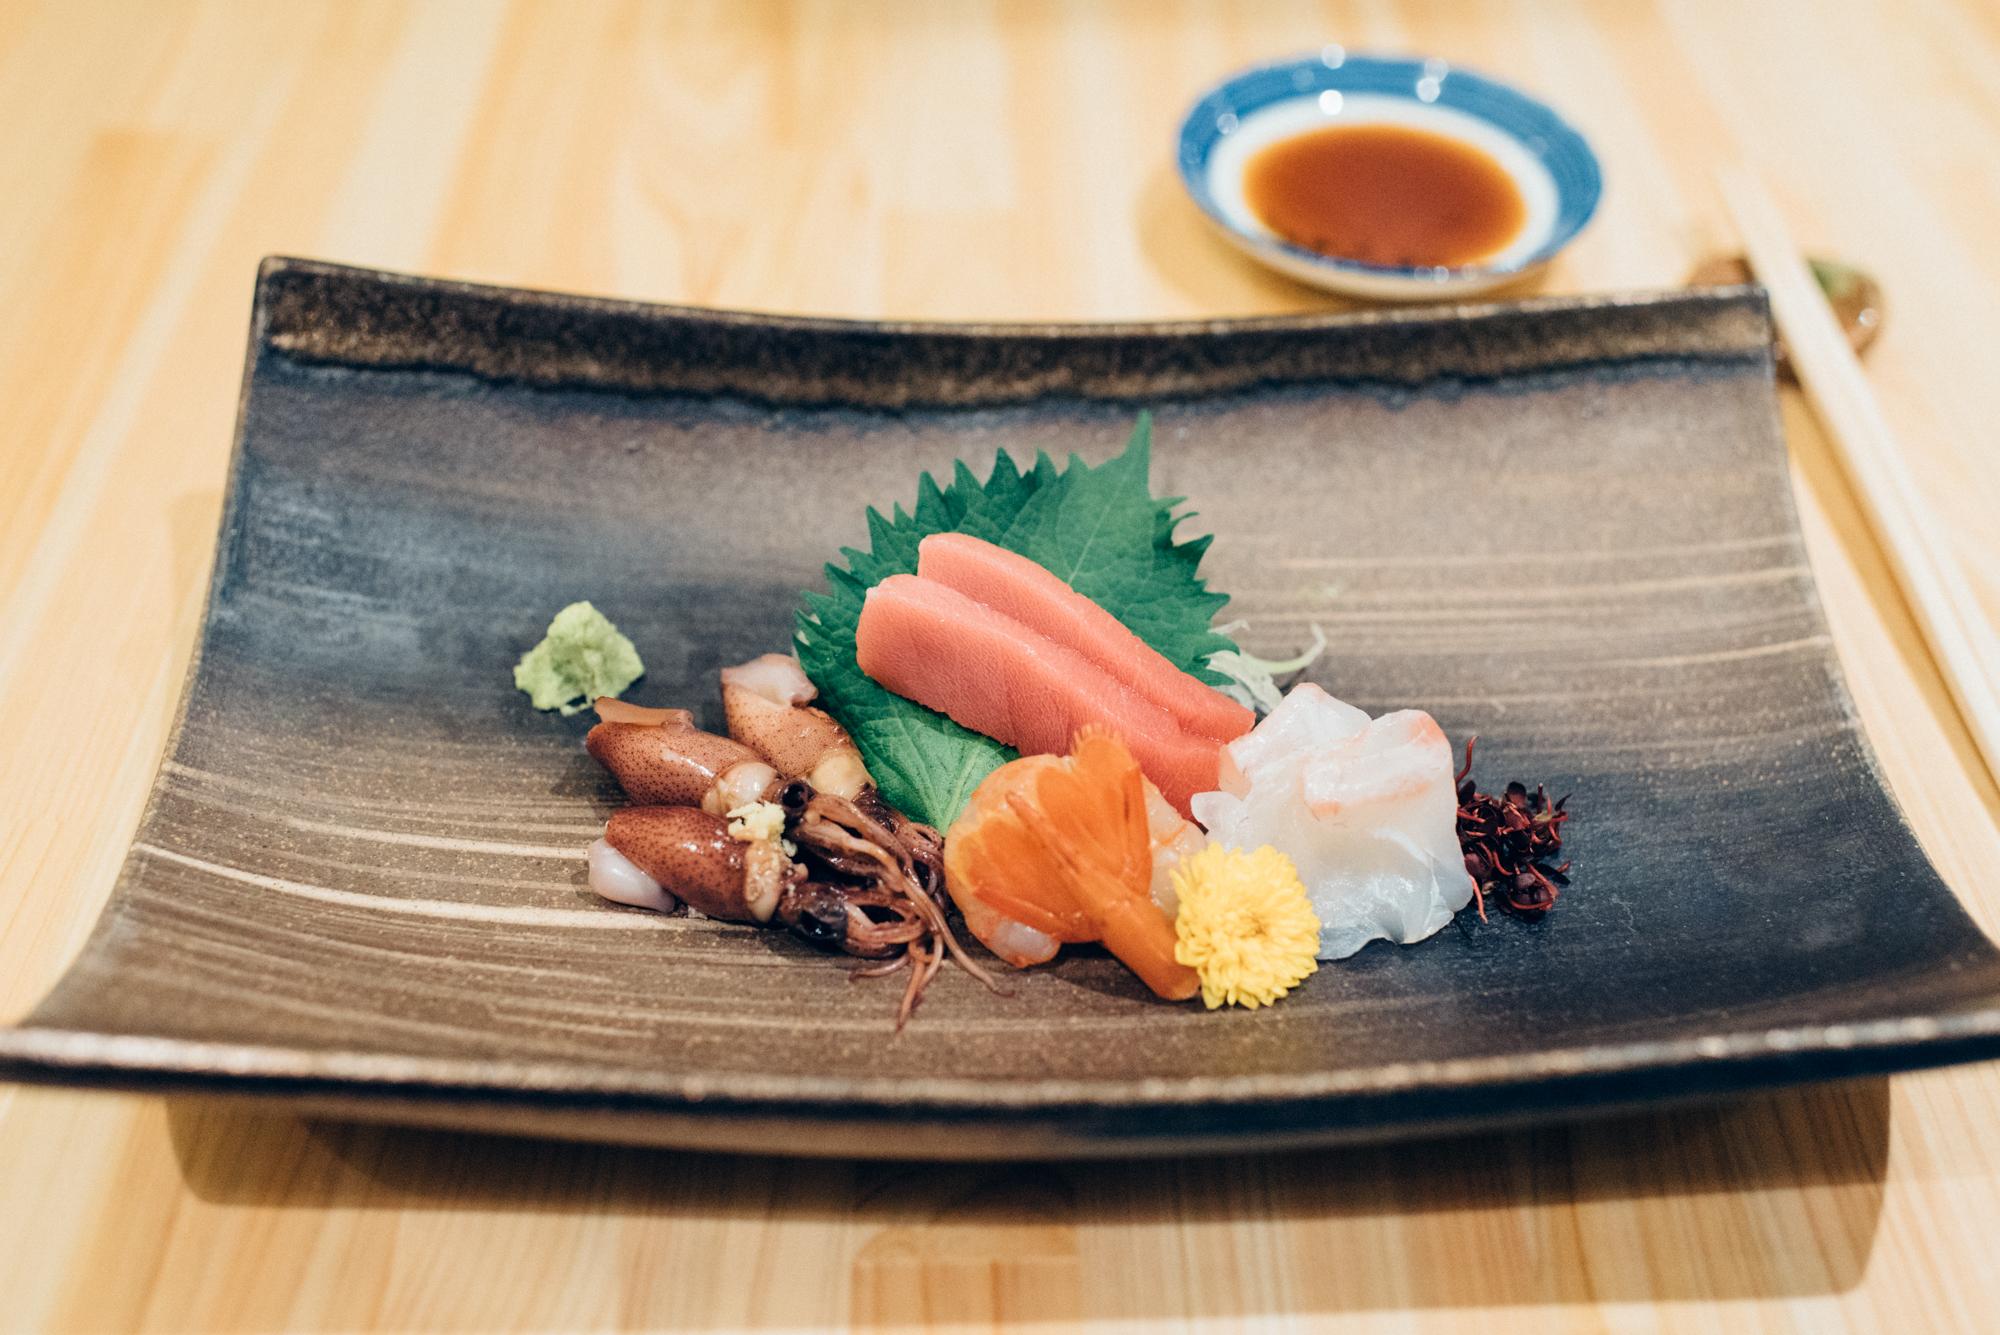 toronto-omakase-sushi-shoushin-7.jpg